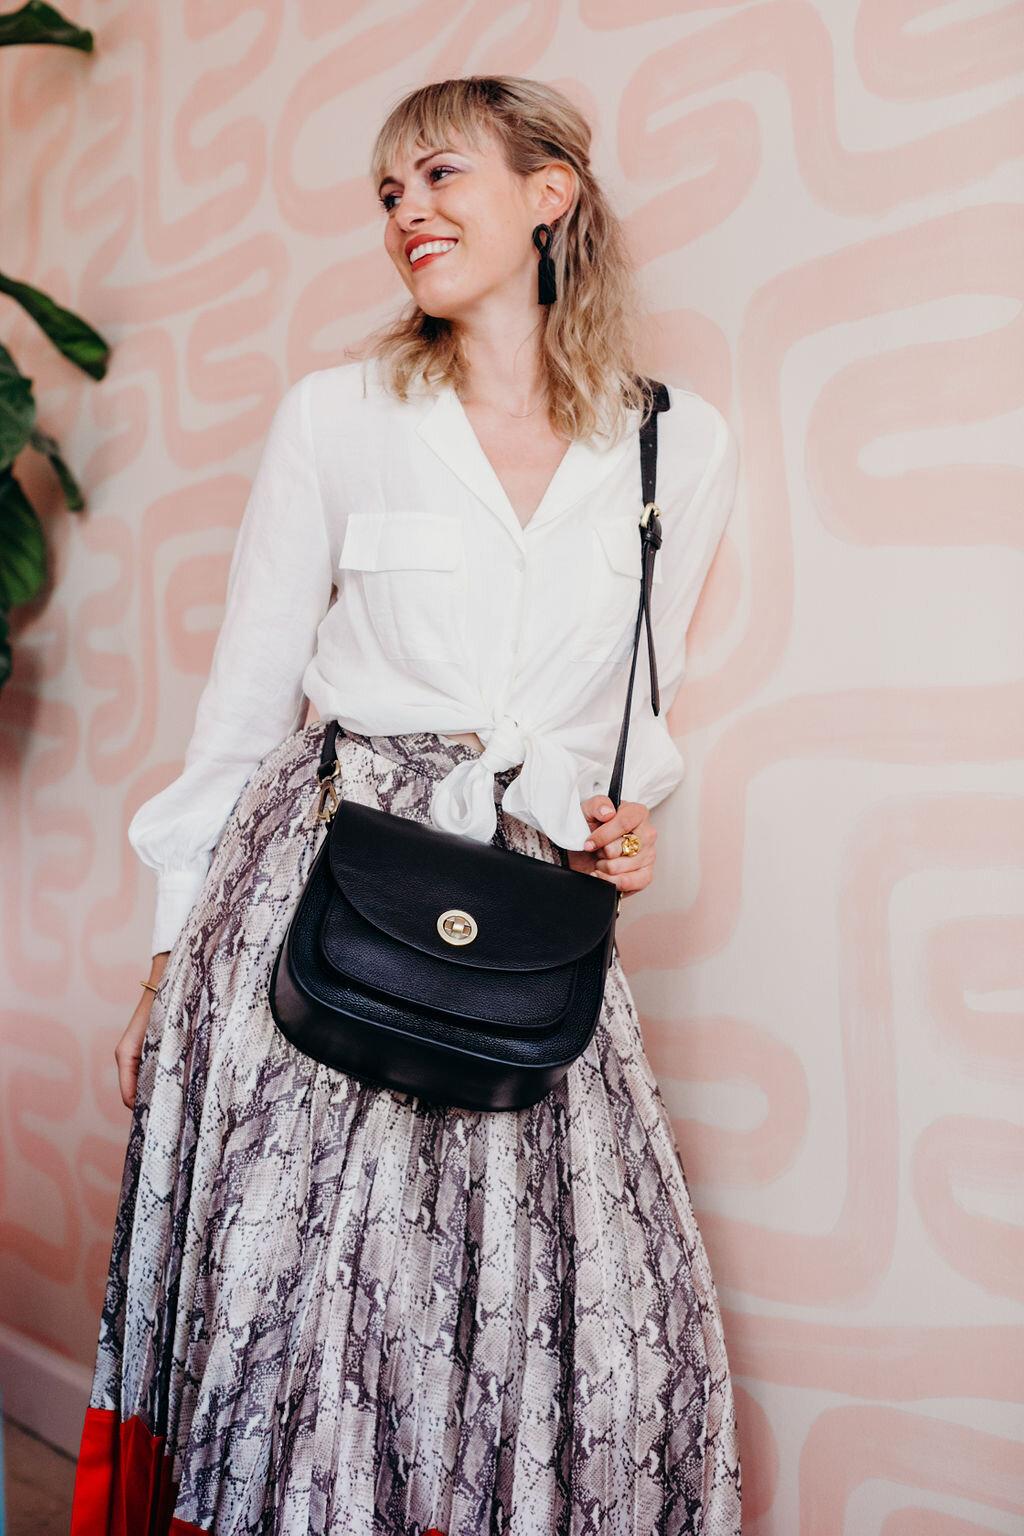 stylish mirrorless camera bag for women